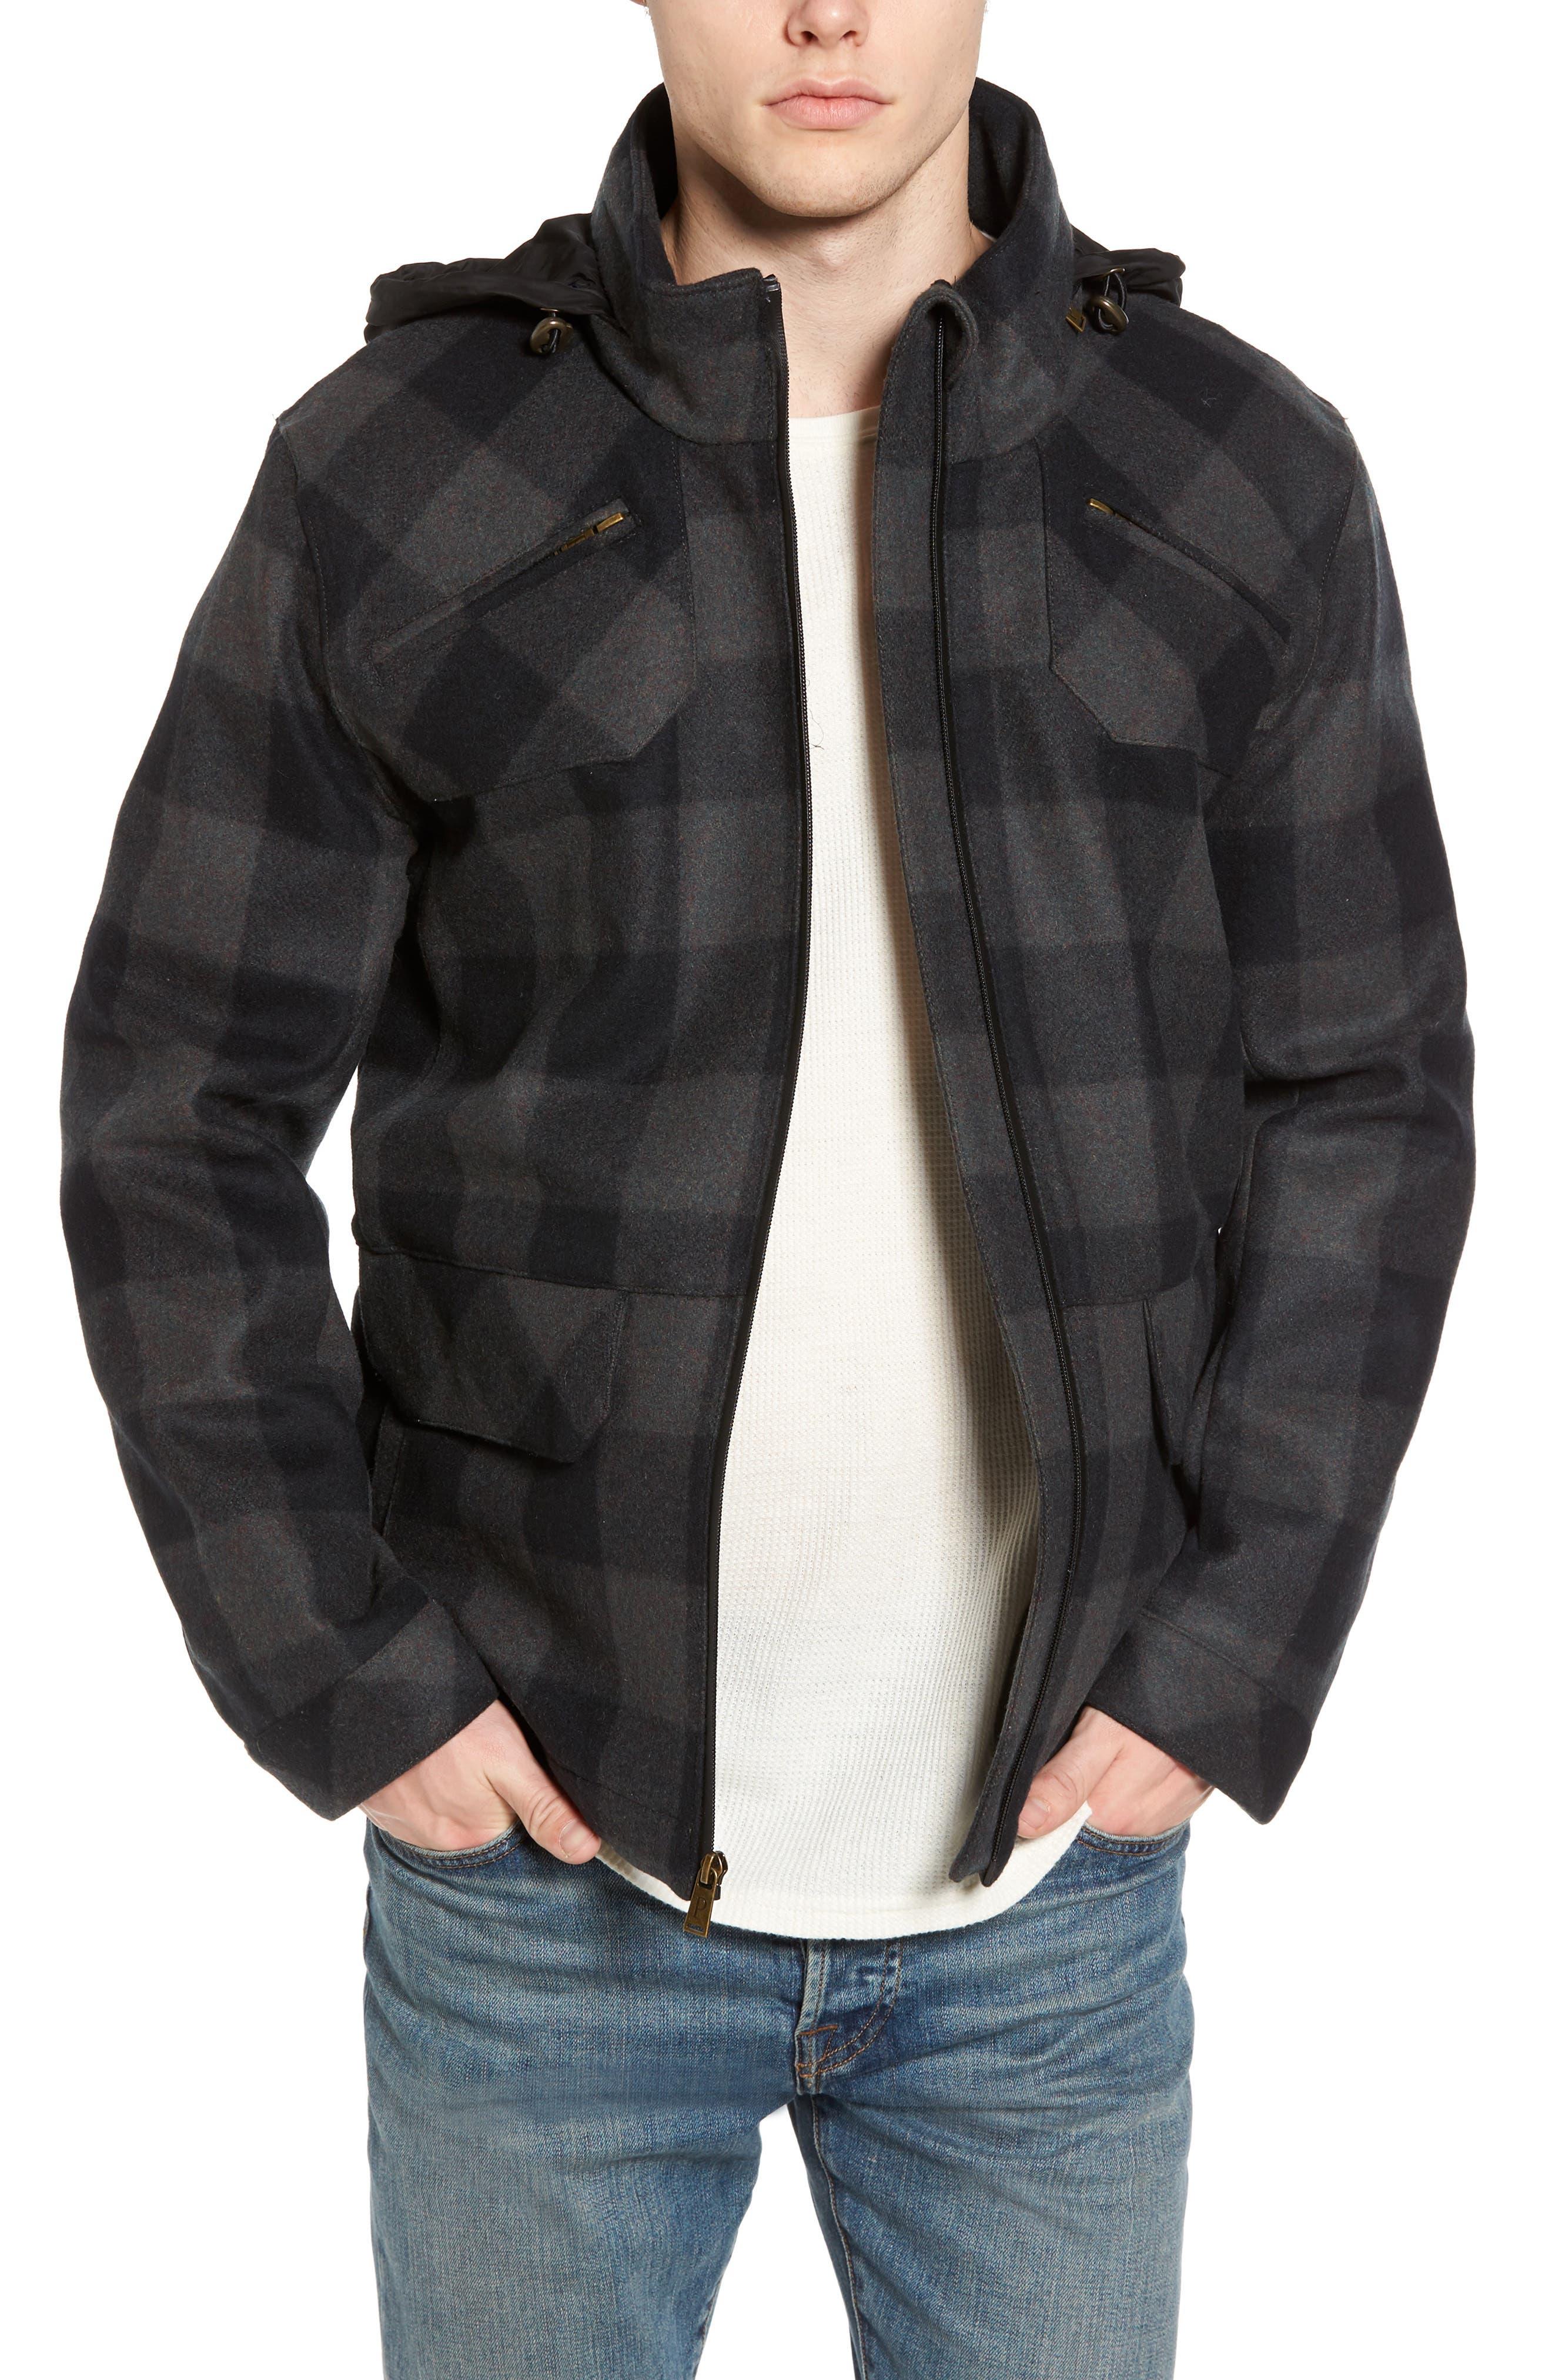 Main Image - Pendleton Albuquerque Jacket